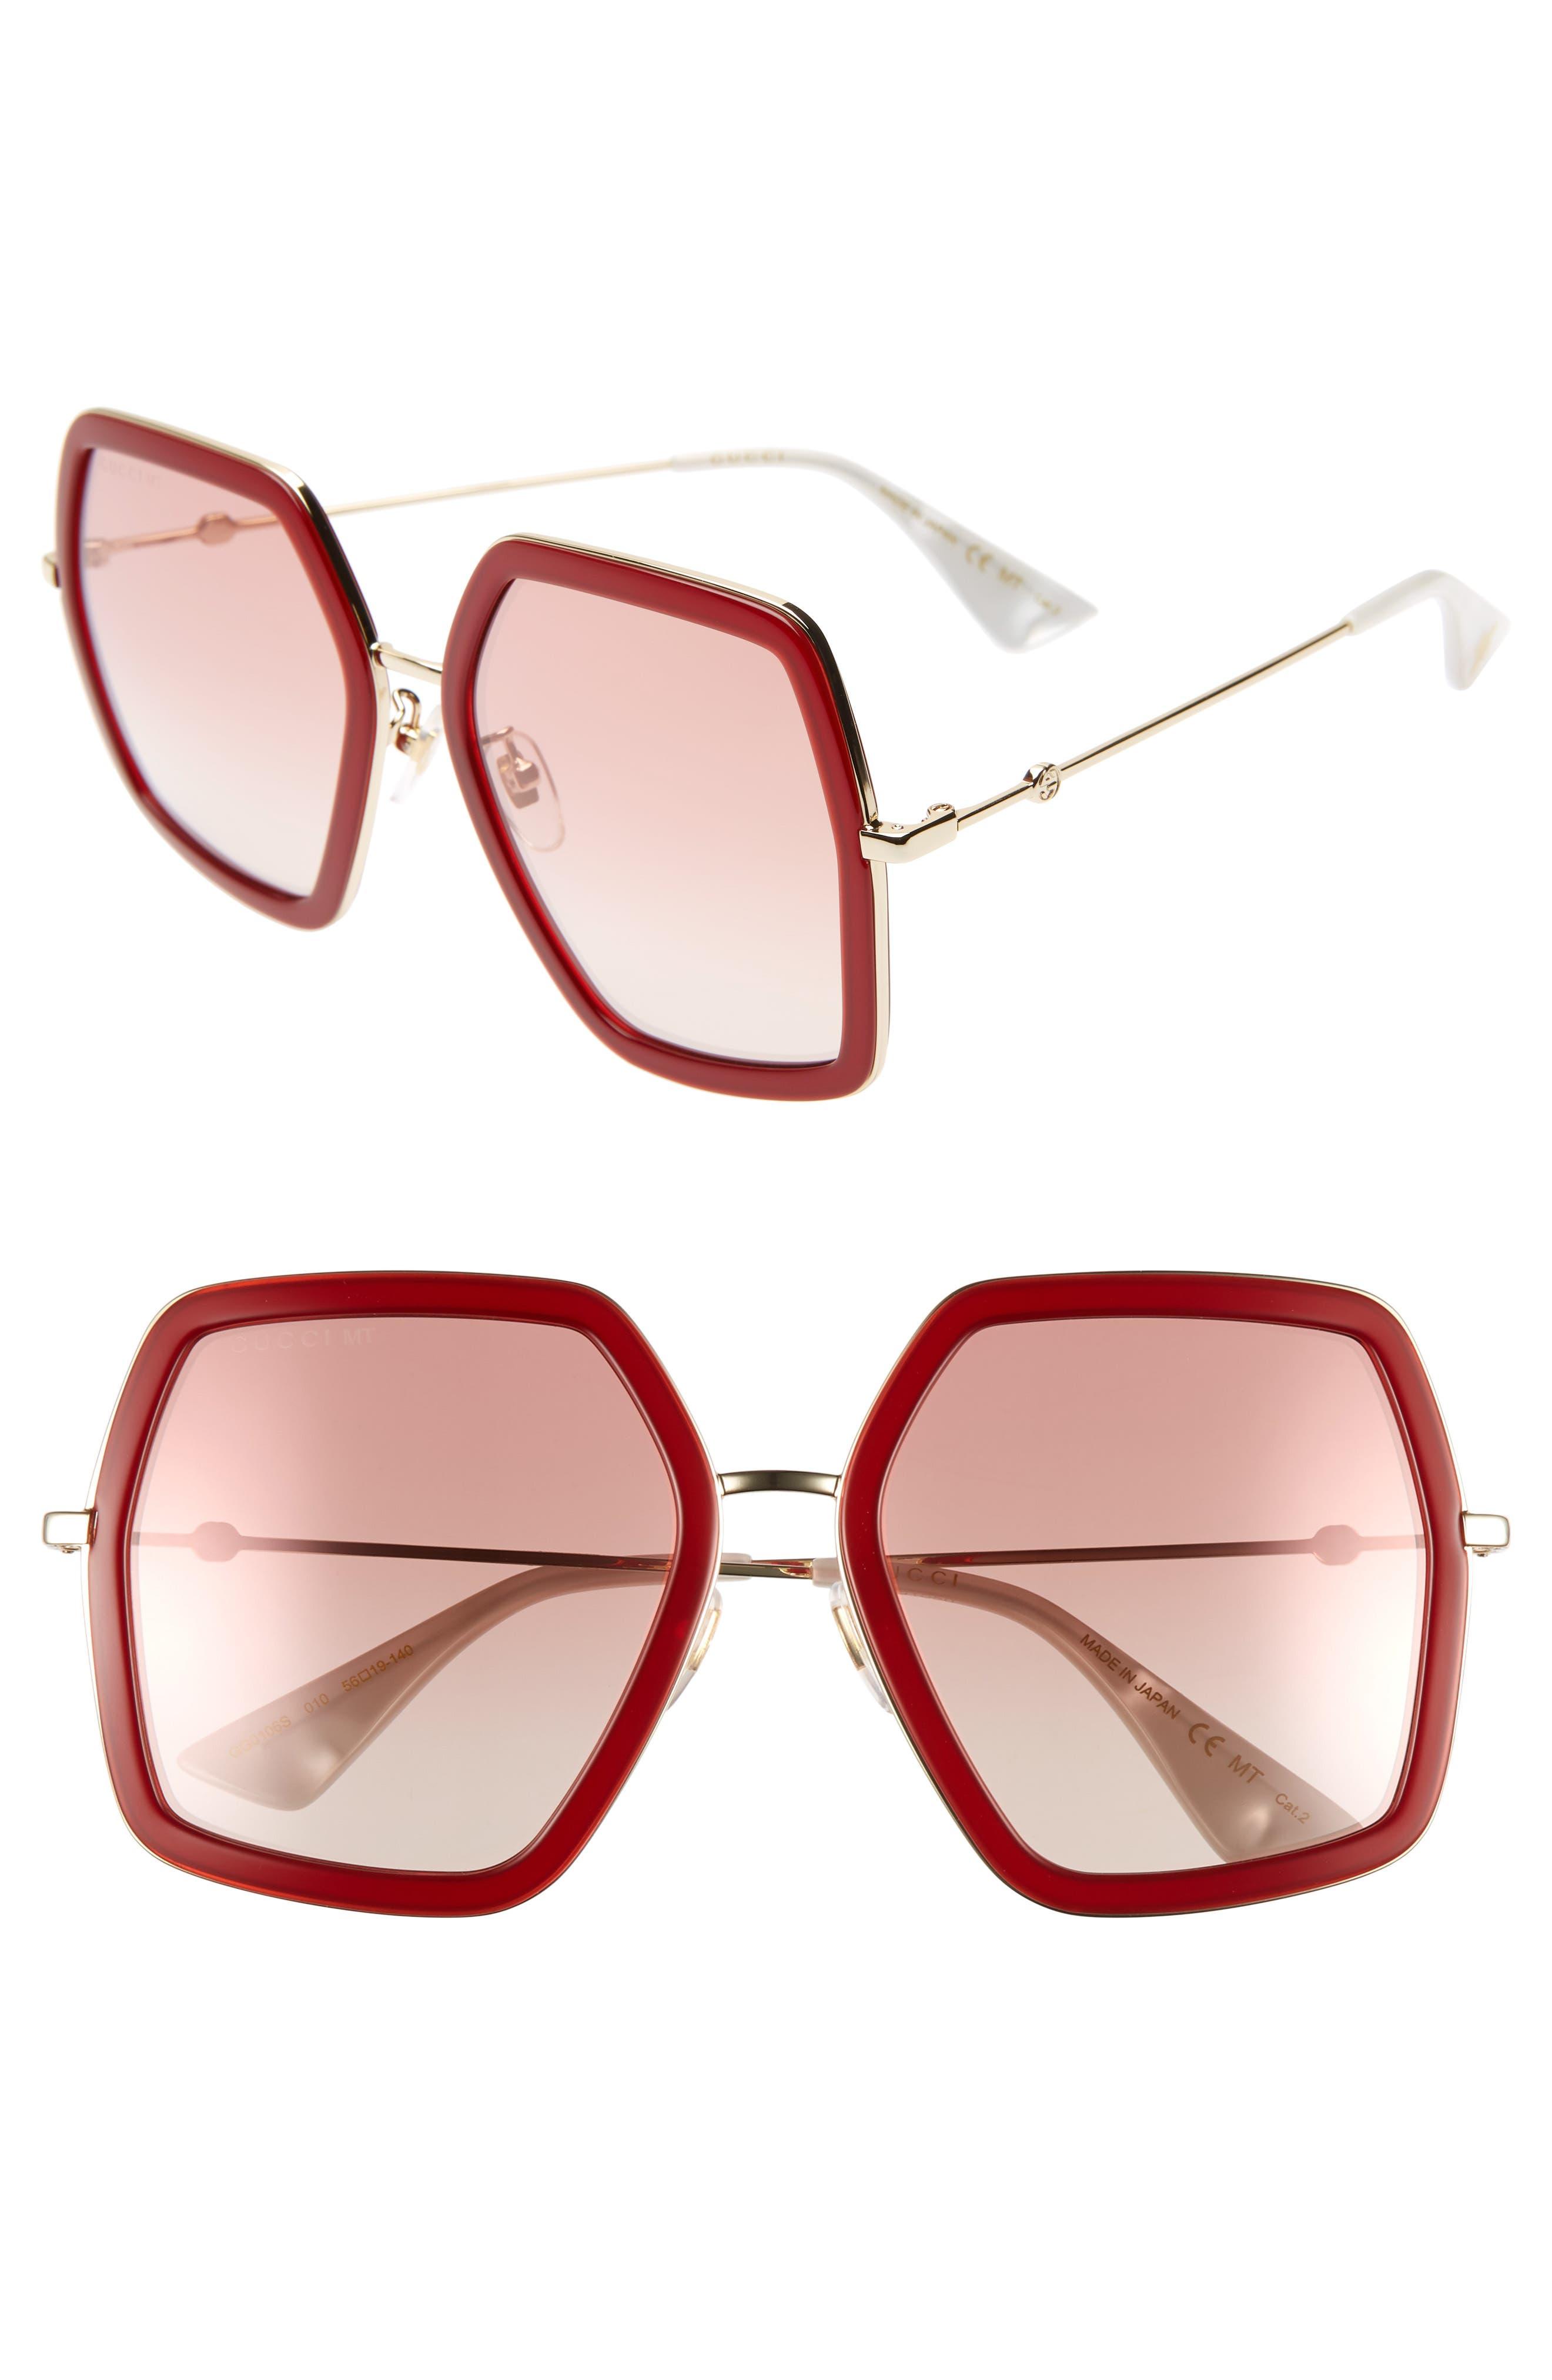 Gucci 5m Sunglasses - Shiny Endura Gld/pk Grad Mir